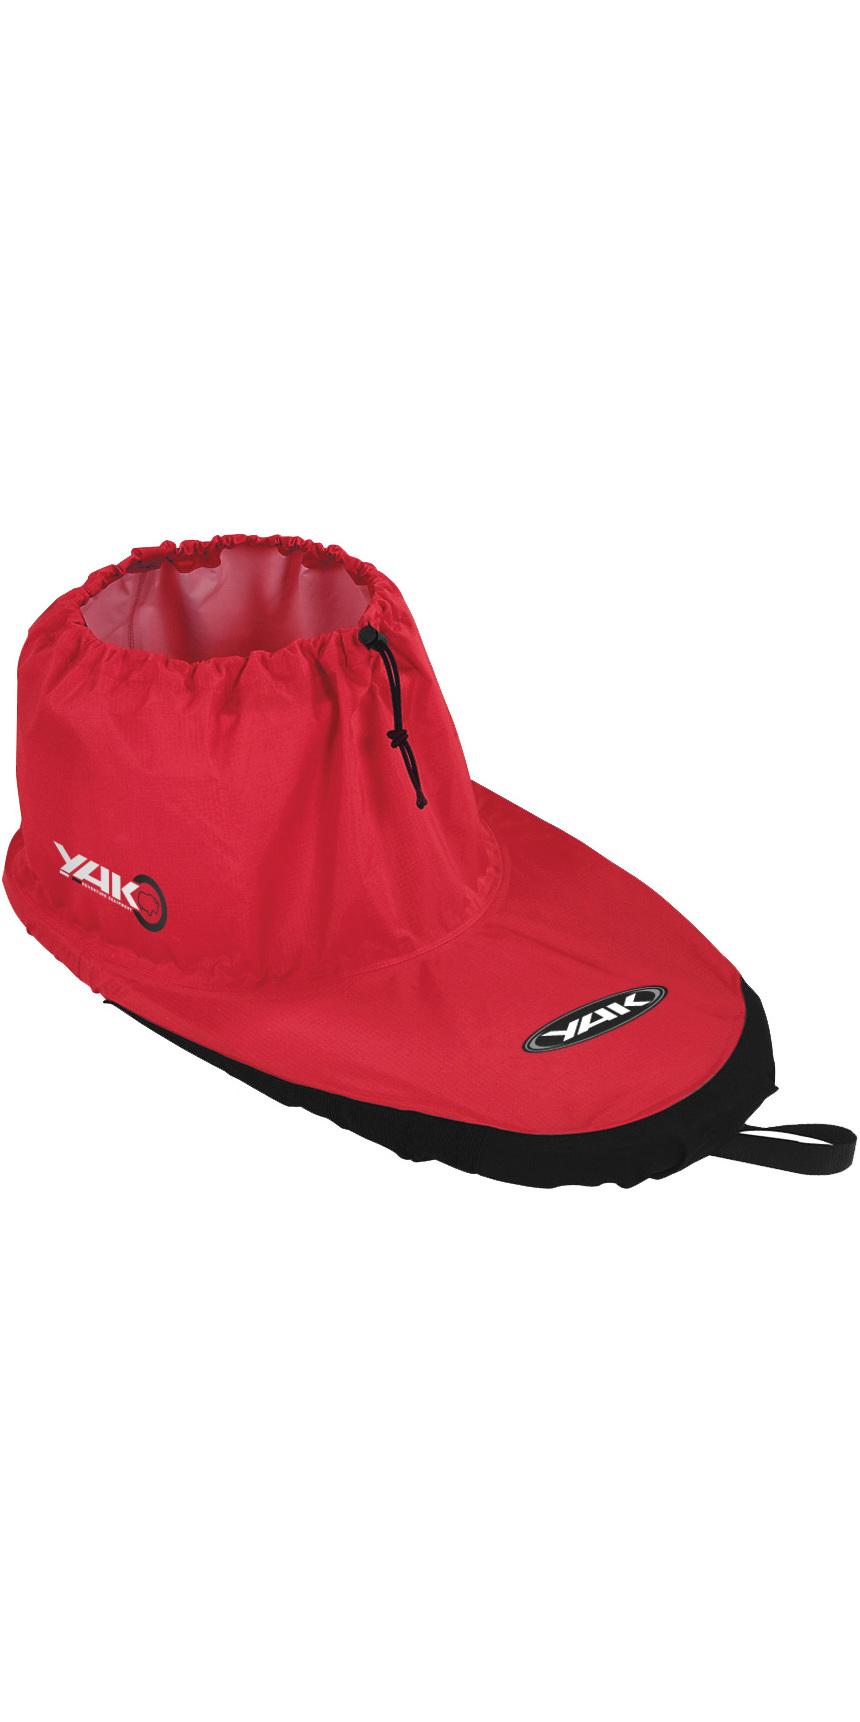 2019 Yak Kayak Kyu Fabric Deck Red 6164